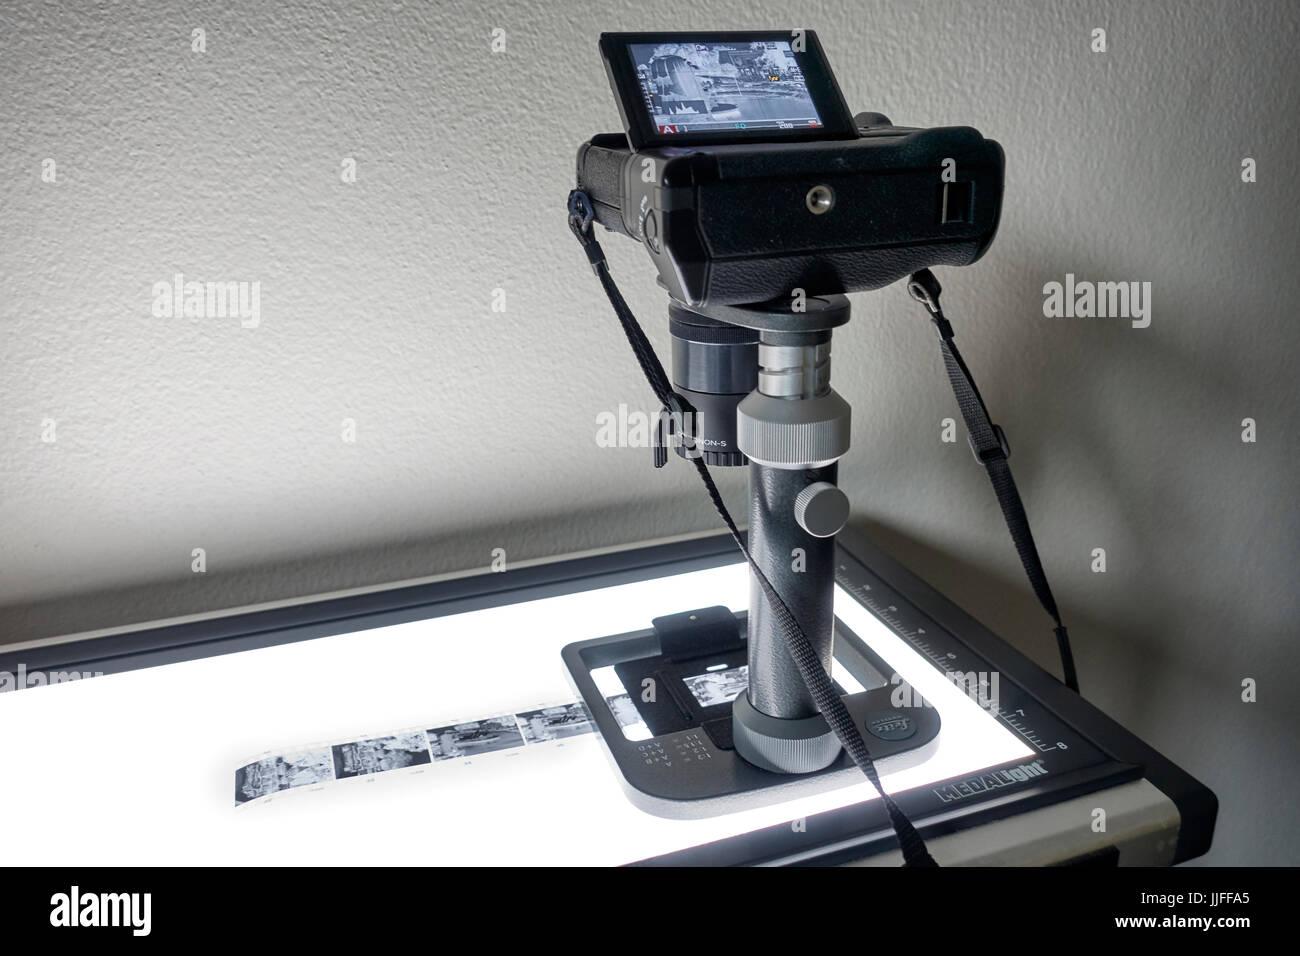 film-copying-and-digitizing-setup-leica-